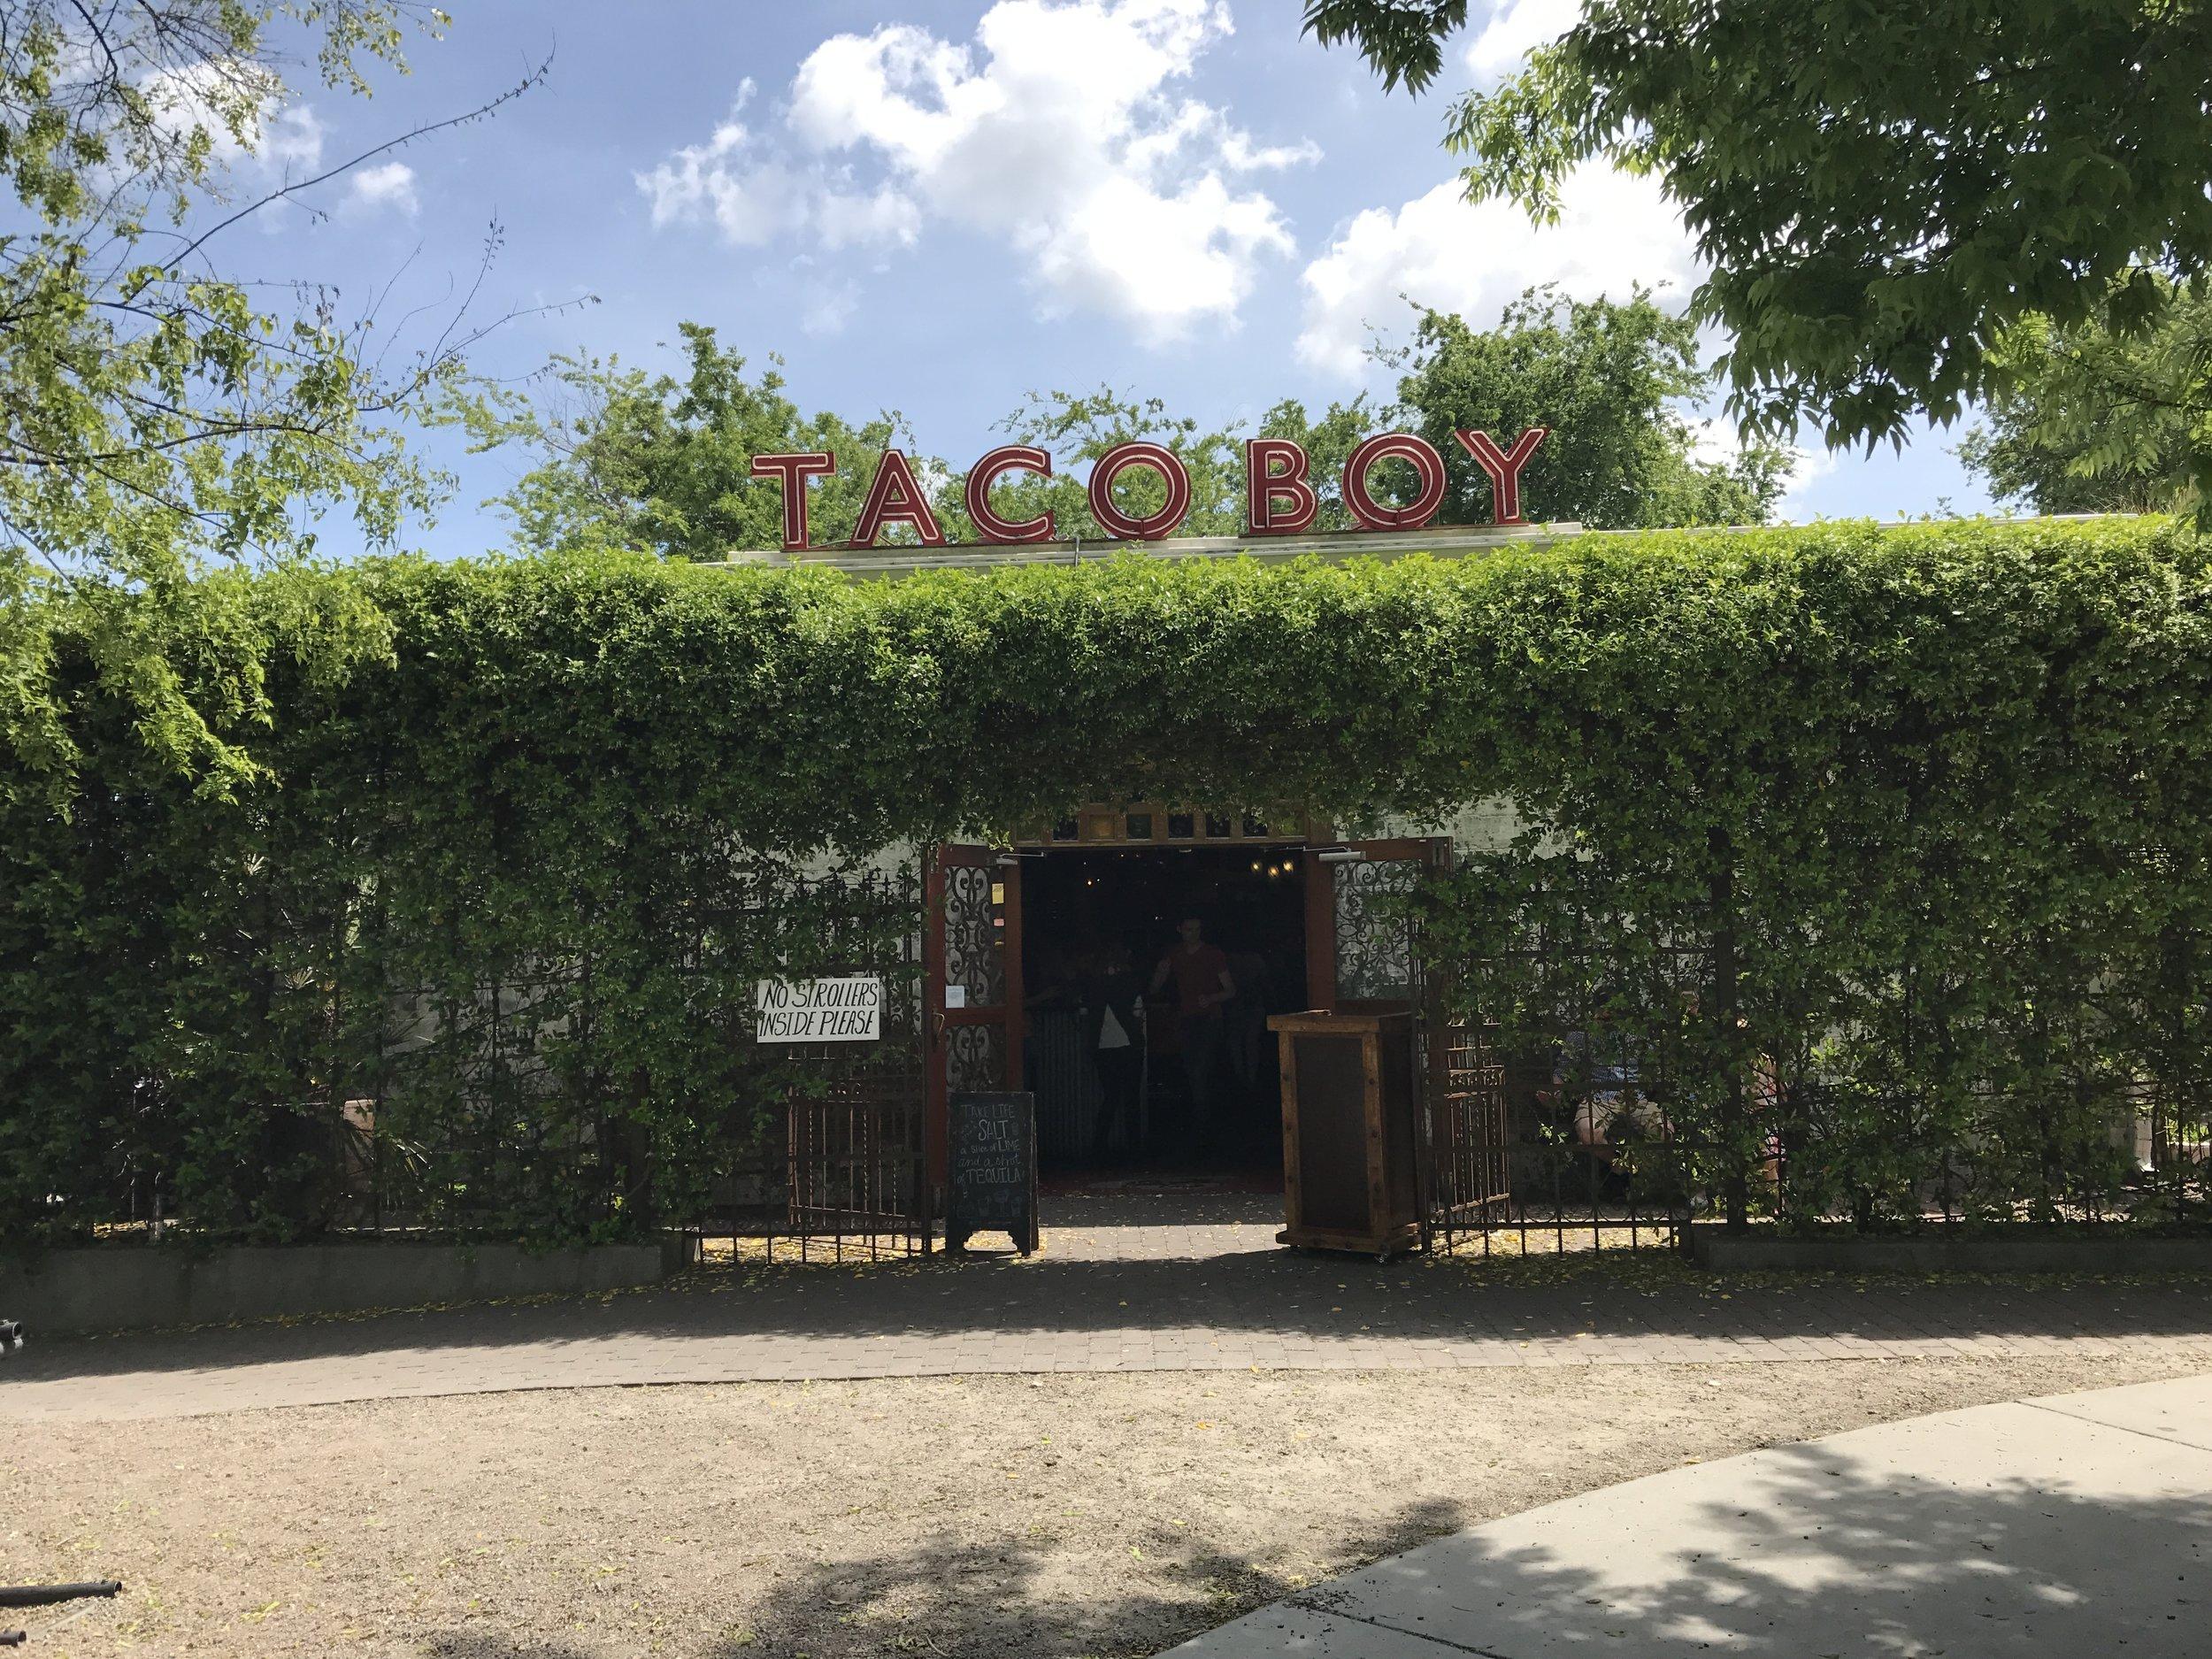 taco boy1.JPG